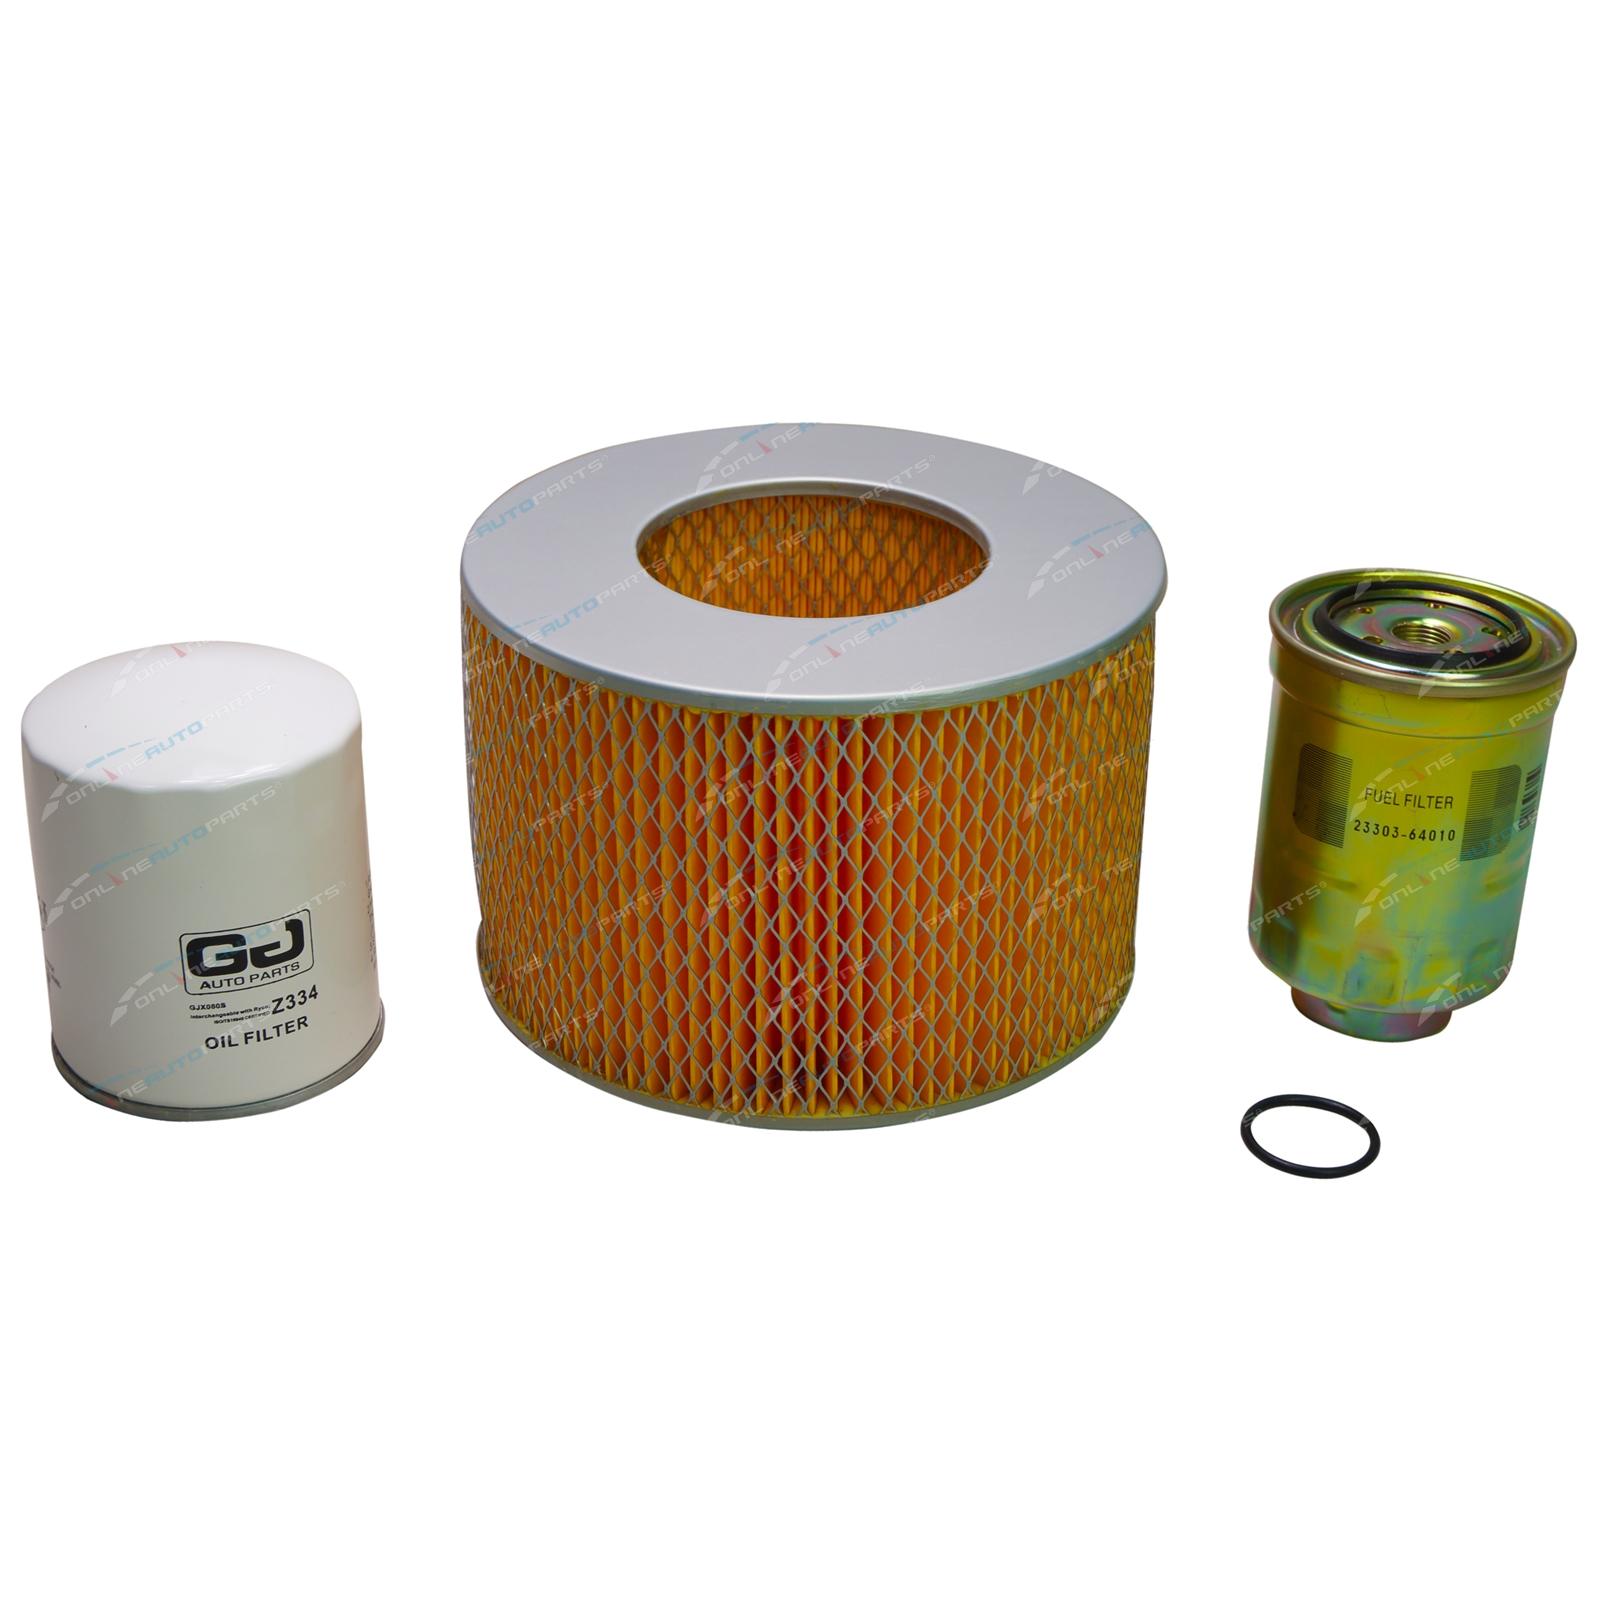 hight resolution of air oil fuel filter service kit suits toyota 1pz landcruiser pzj70 pzj73 5cy 1pz diesel engine